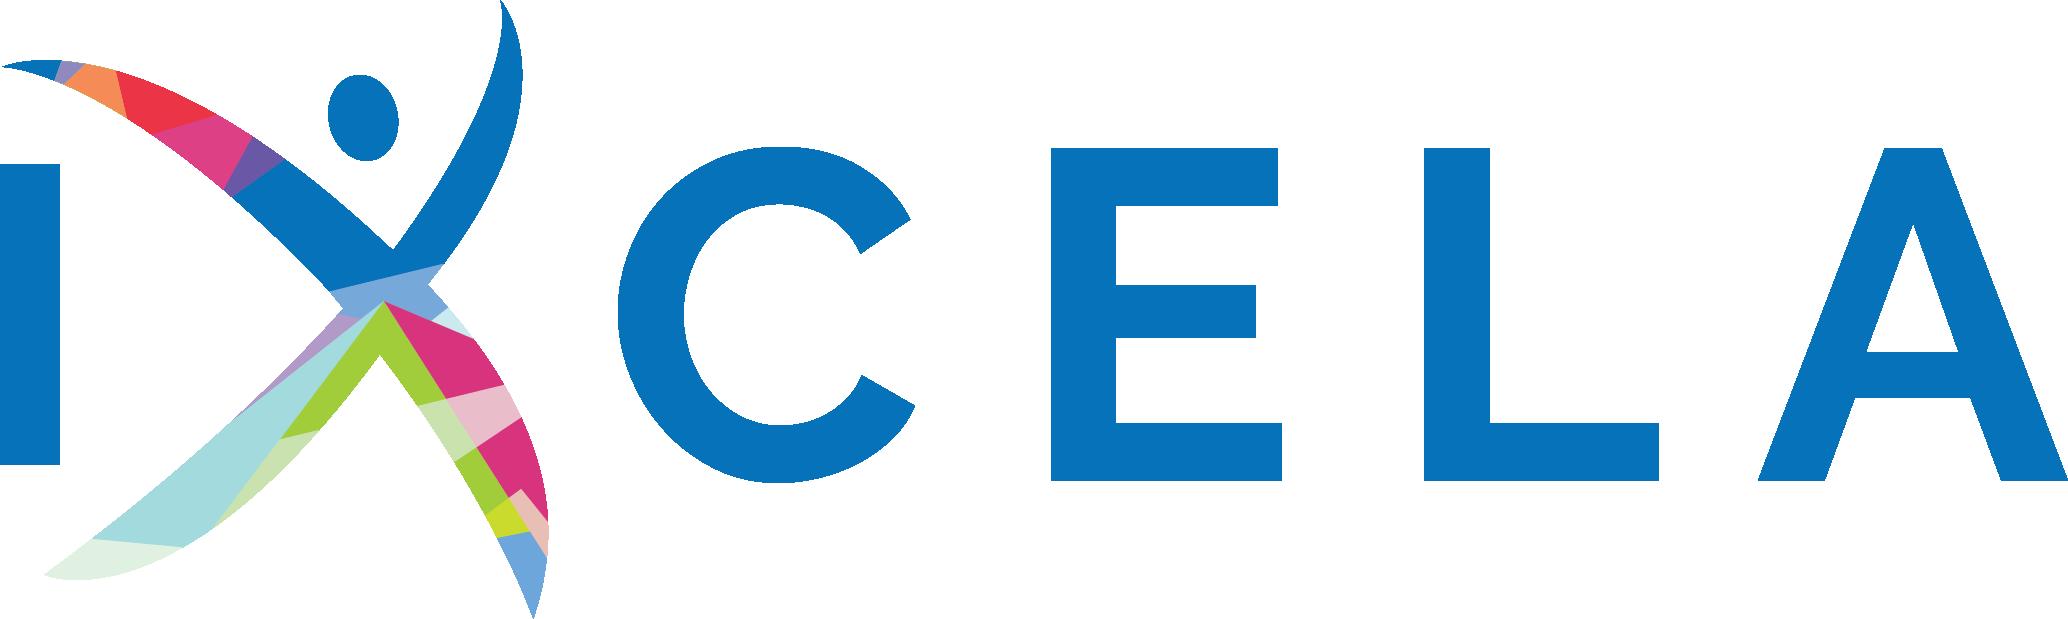 ixcela_logo_no_tagline-2